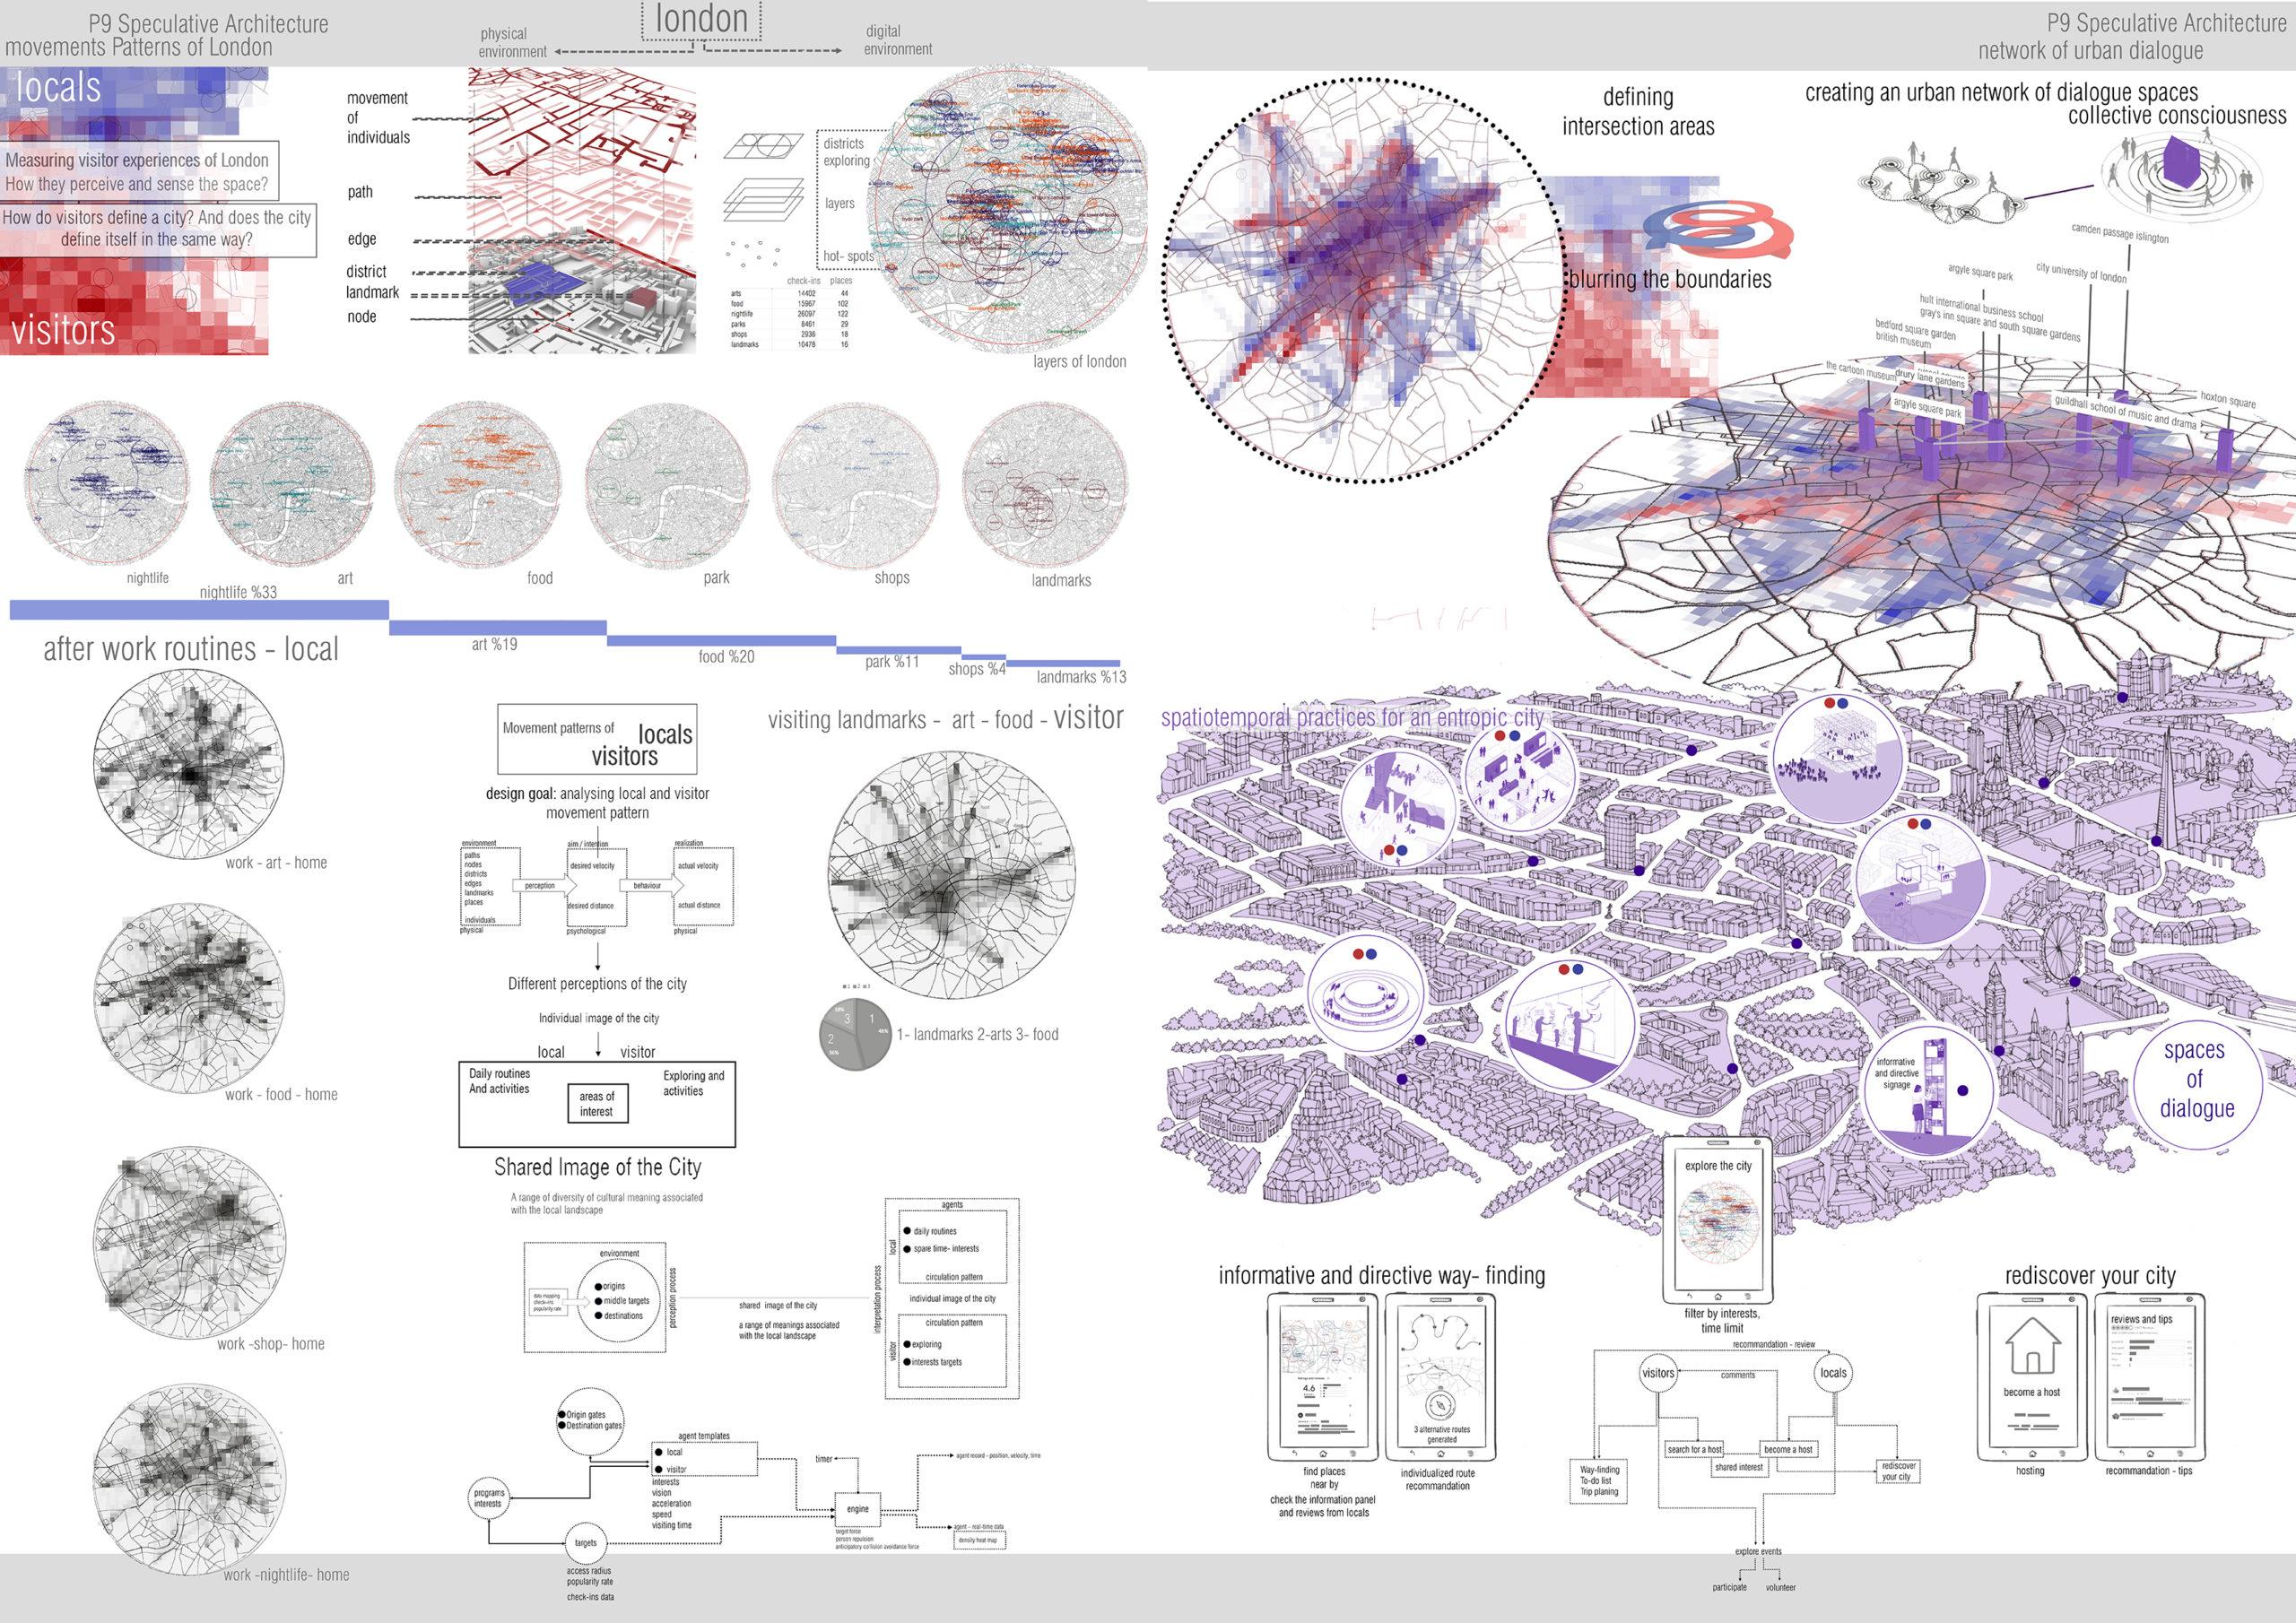 Movement Patterns of London (Ece Tunca)